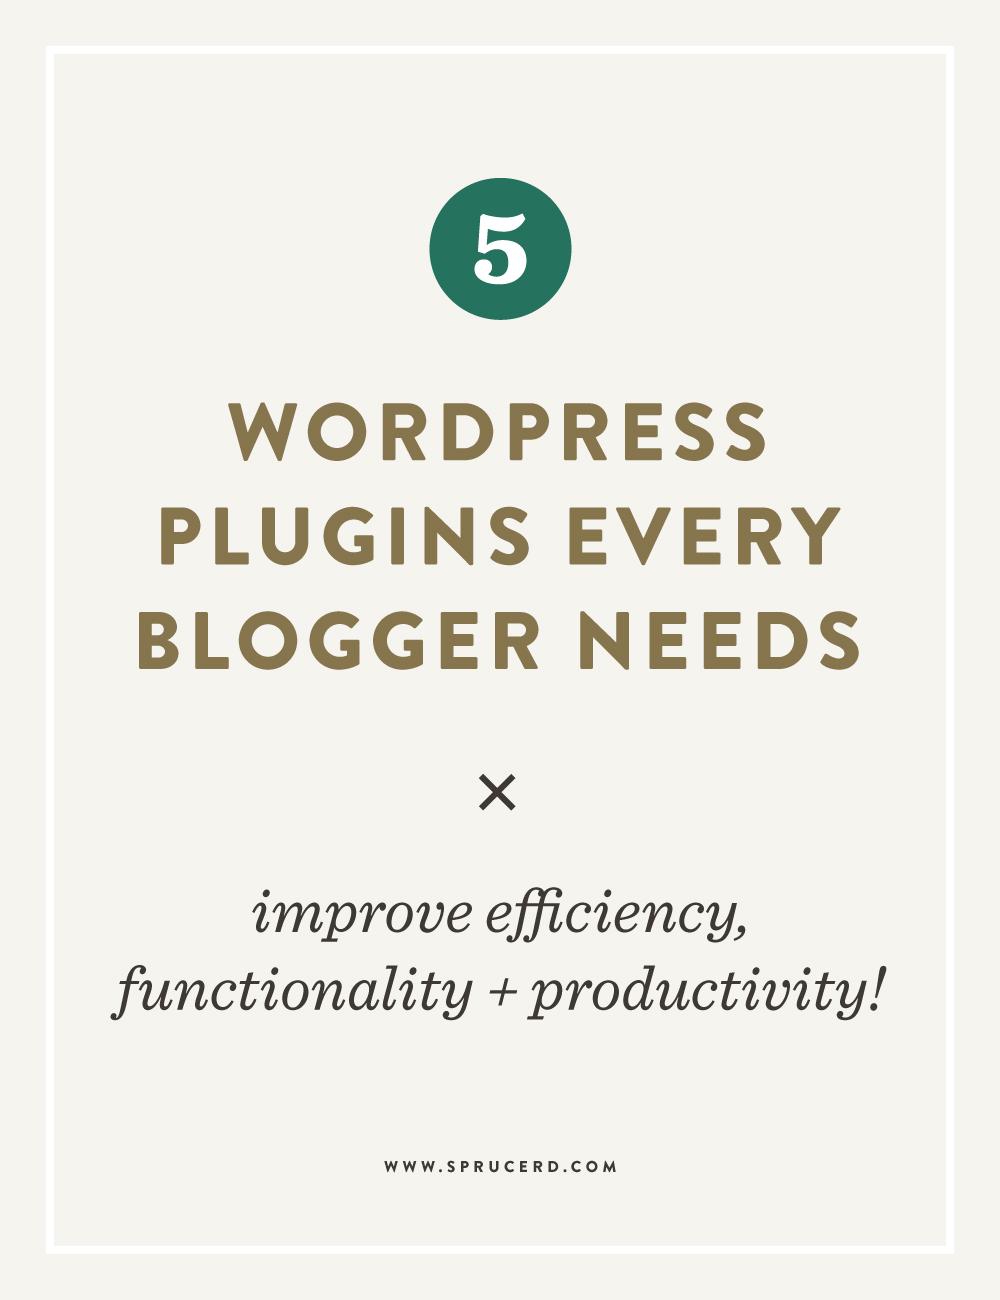 5 Wordpress Plugins Every Blogger Needs | Spruce Rd.